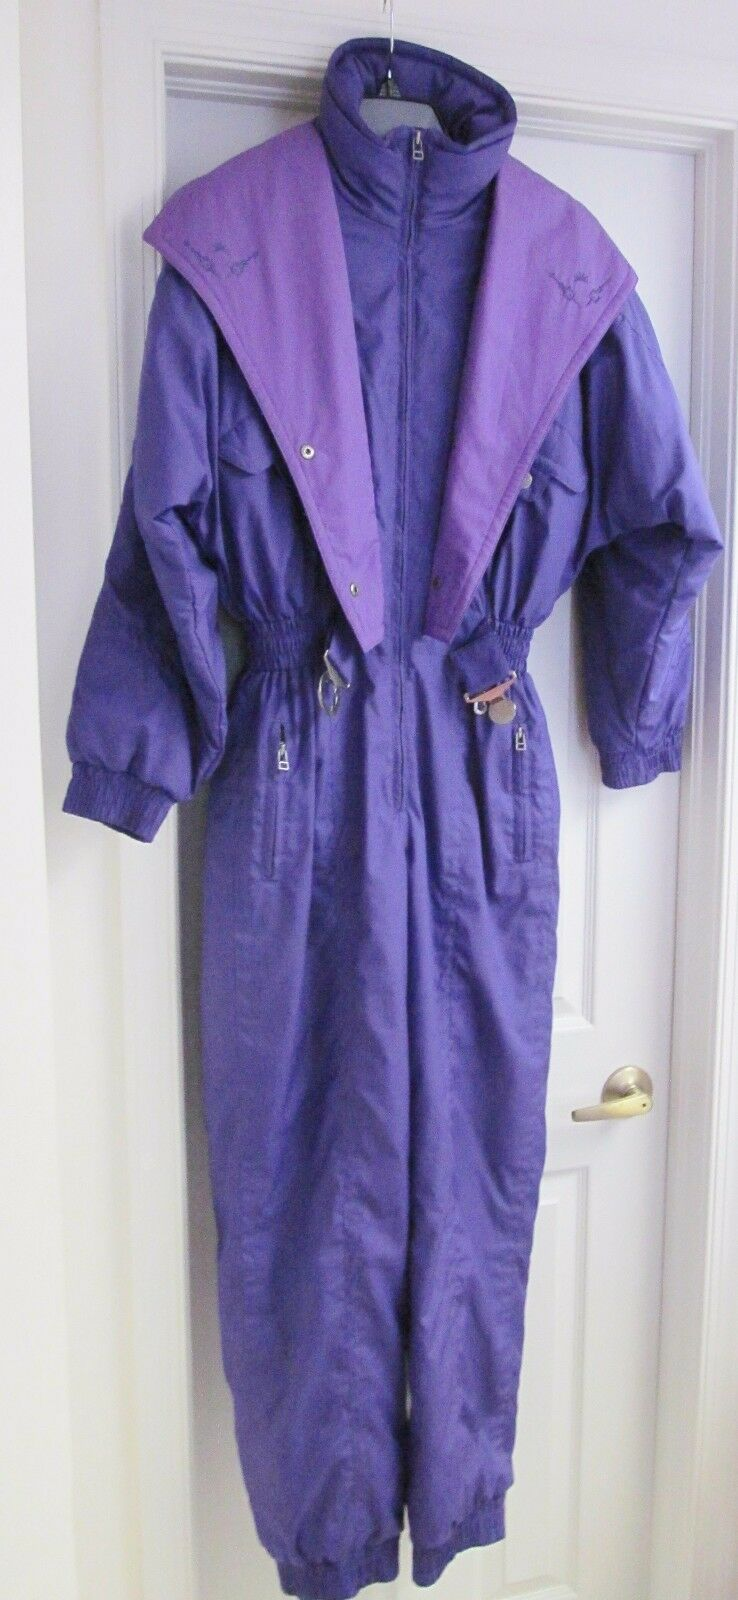 JUPA  SPORTS Women's 1-pc Ski Snowboarding Snow Suit Purple Olympic label Size 8  inexpensive